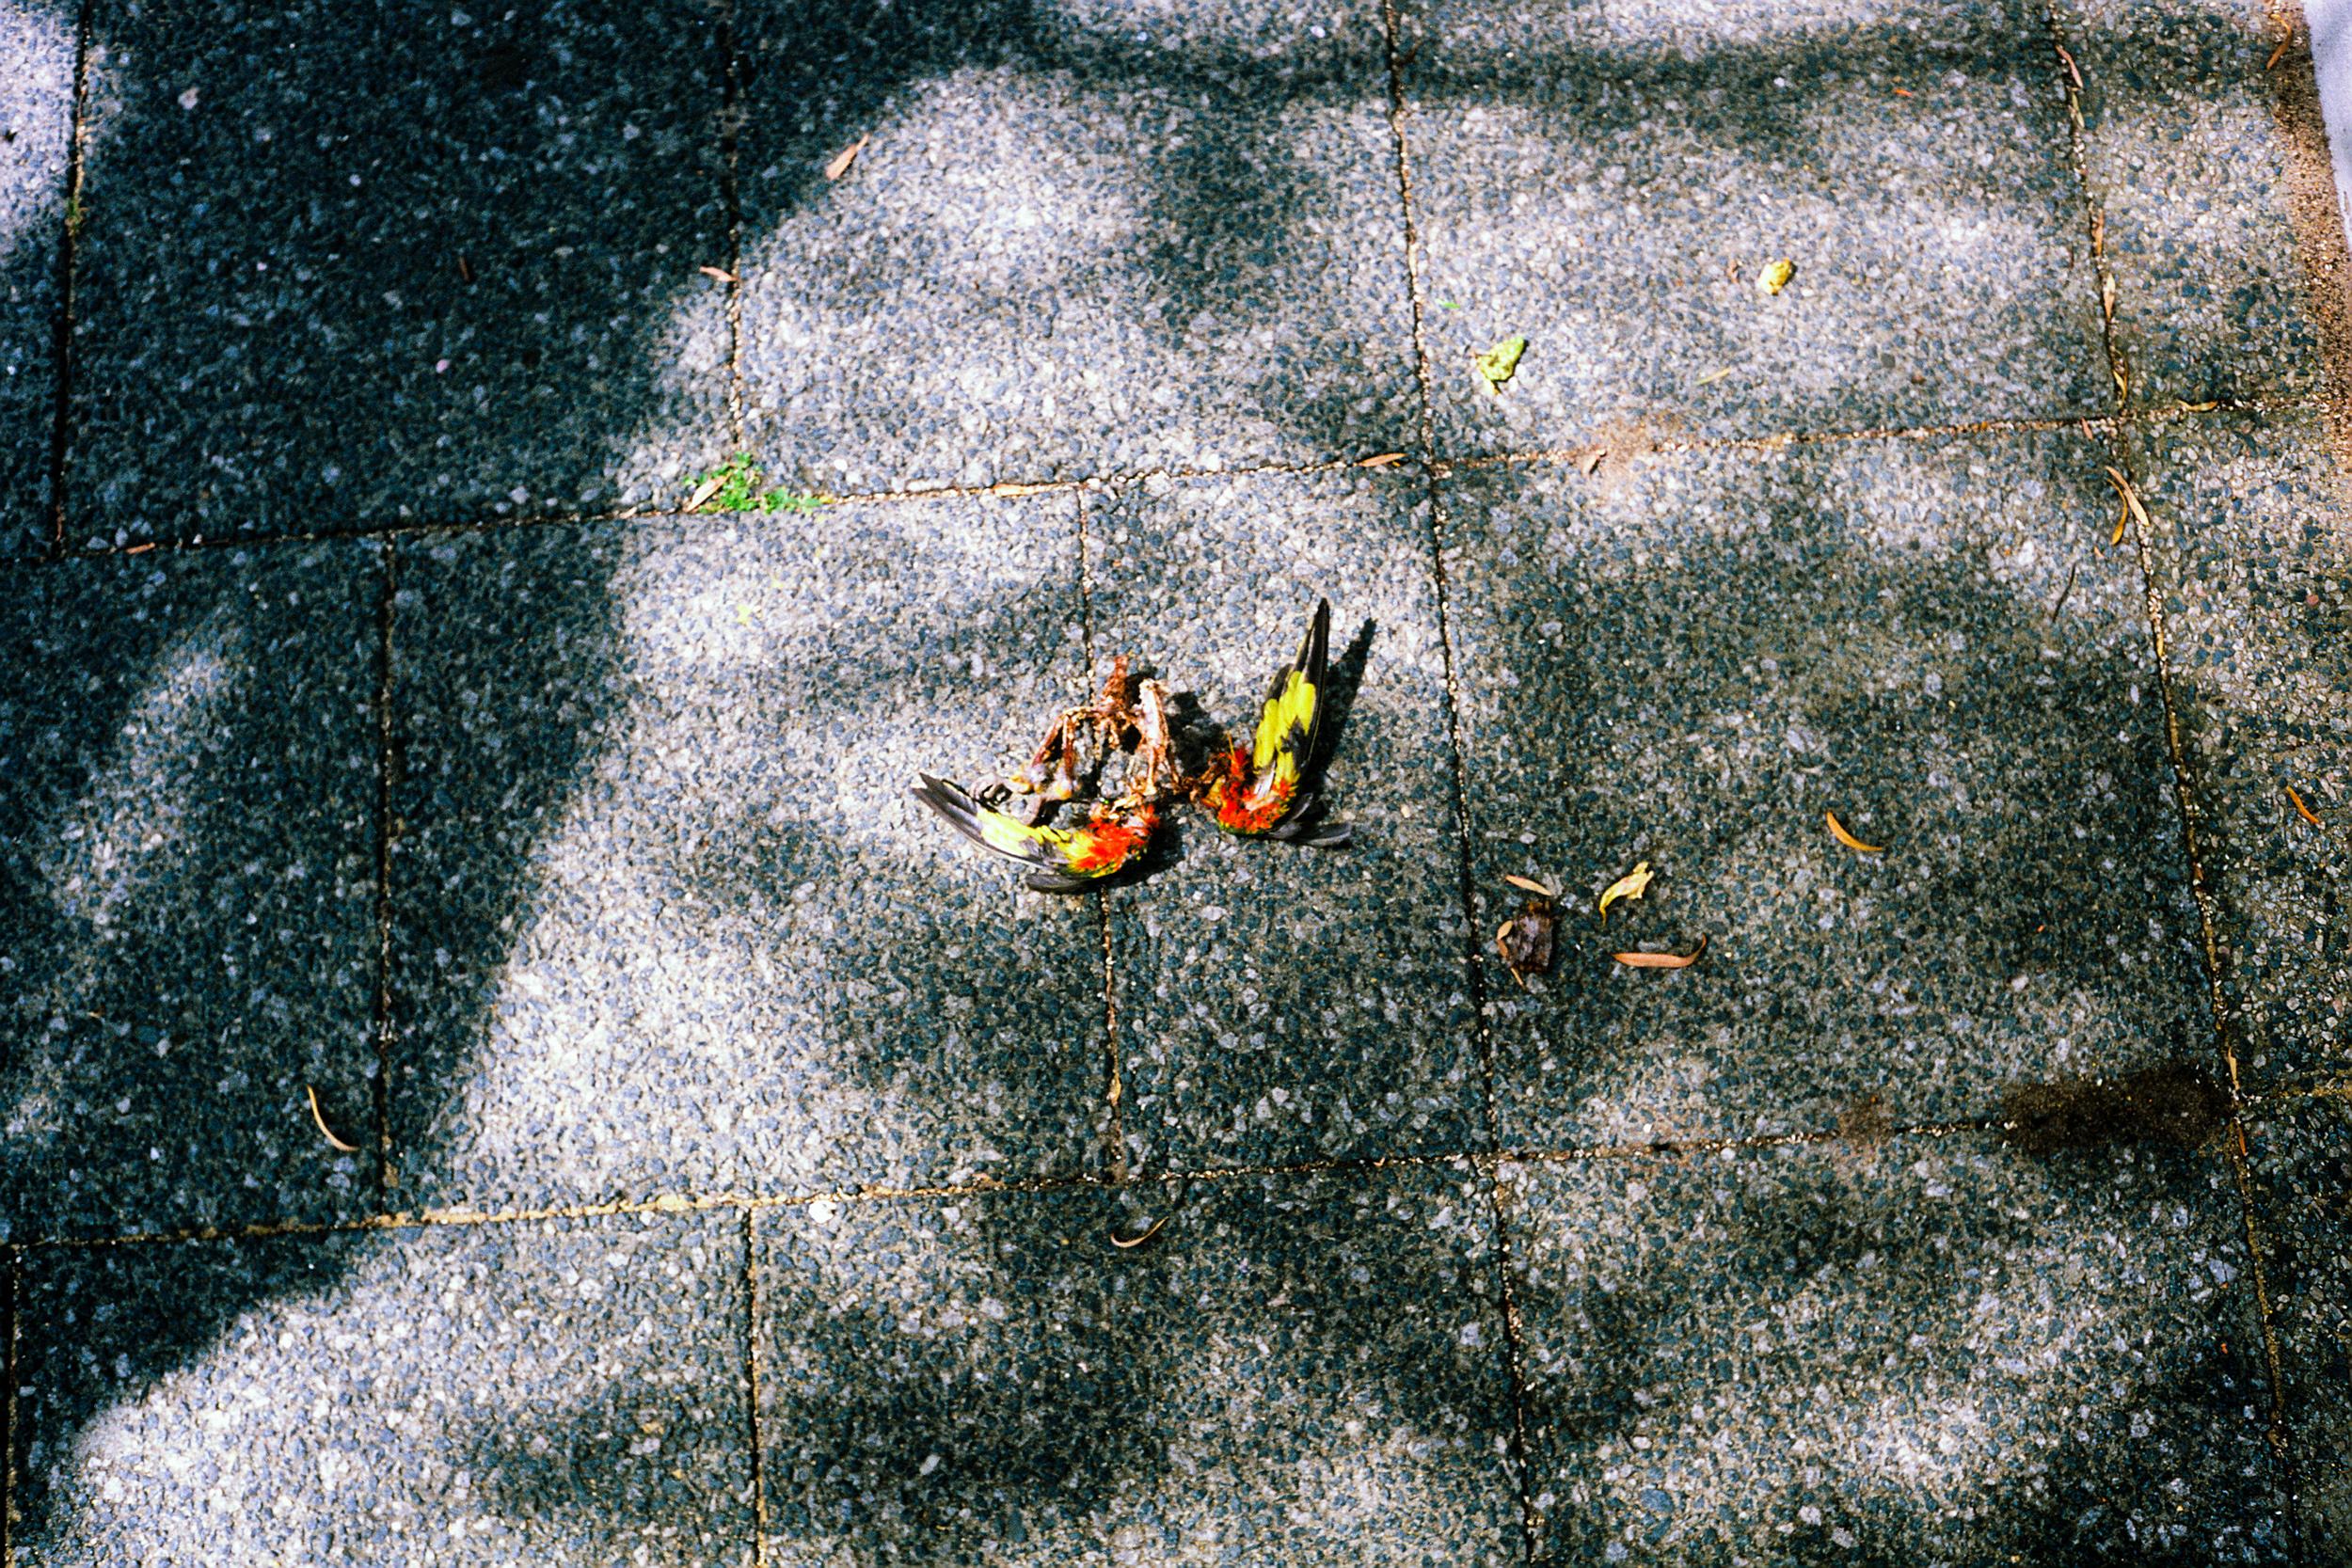 justin_tan_torres_australian_street_photography_bird_road_kill_carcass_perth_2015_12.jpg